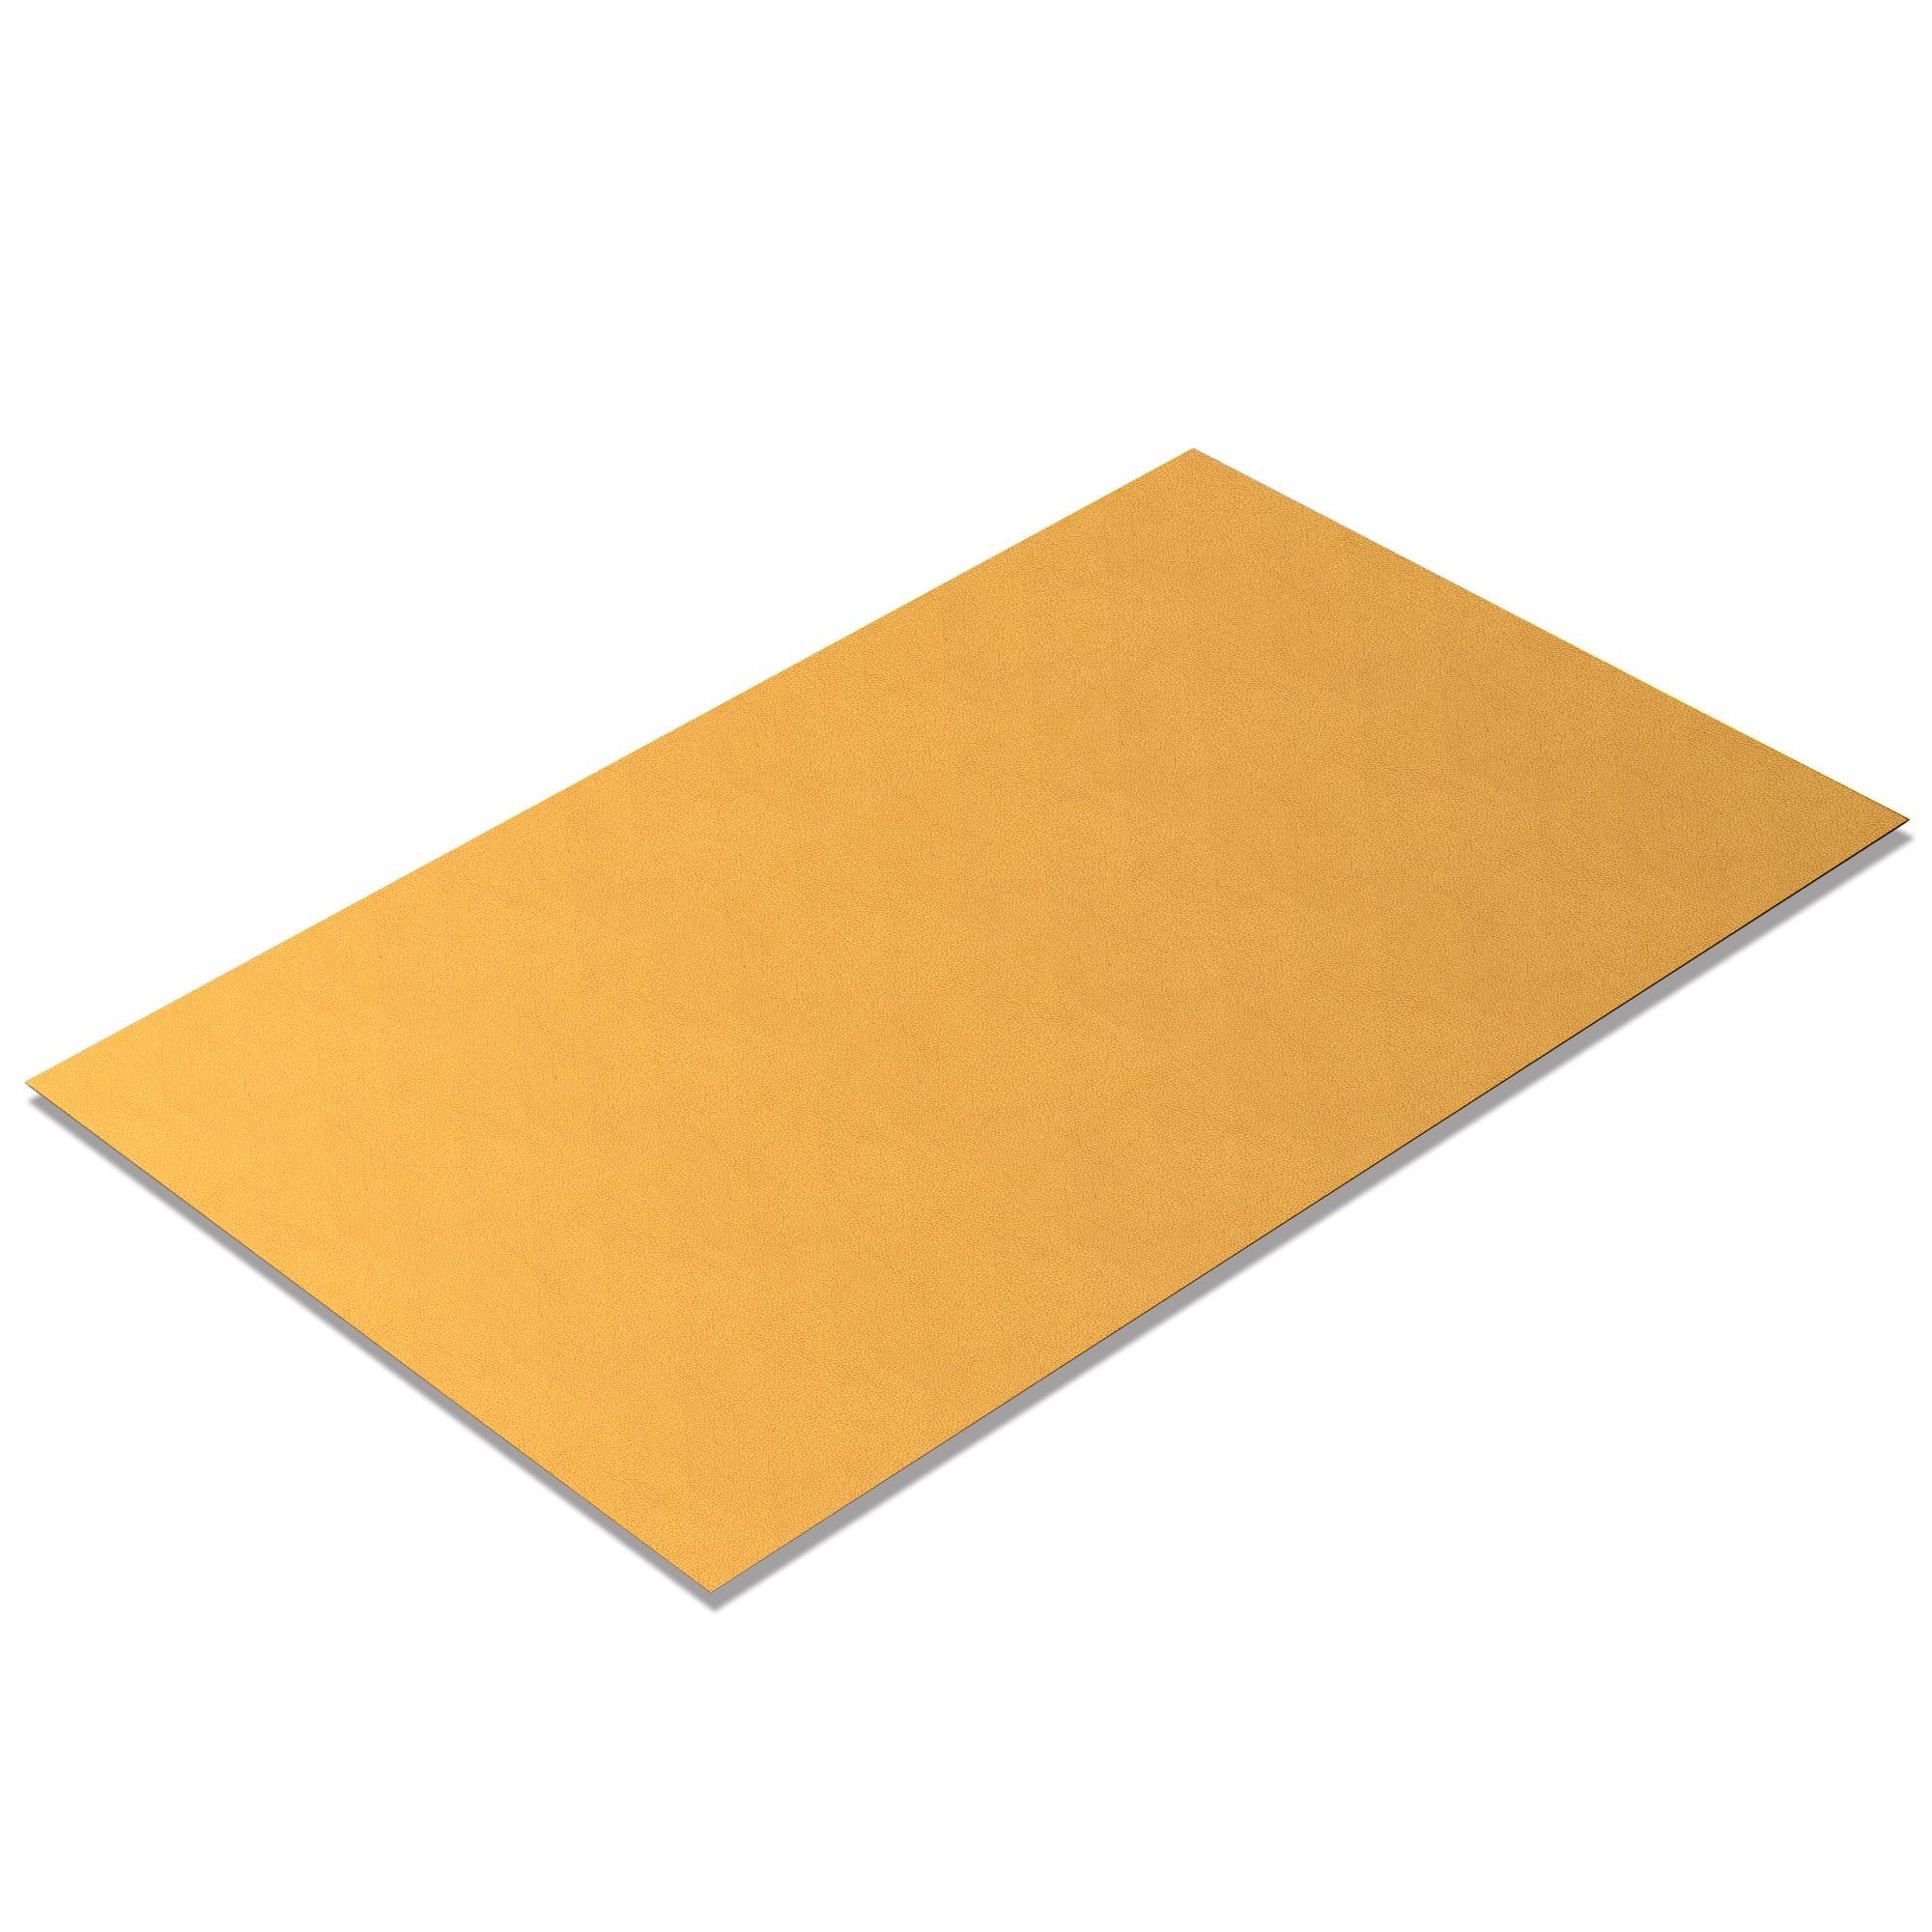 Kunstleder Meterware Latigo Yellow [LAT704]